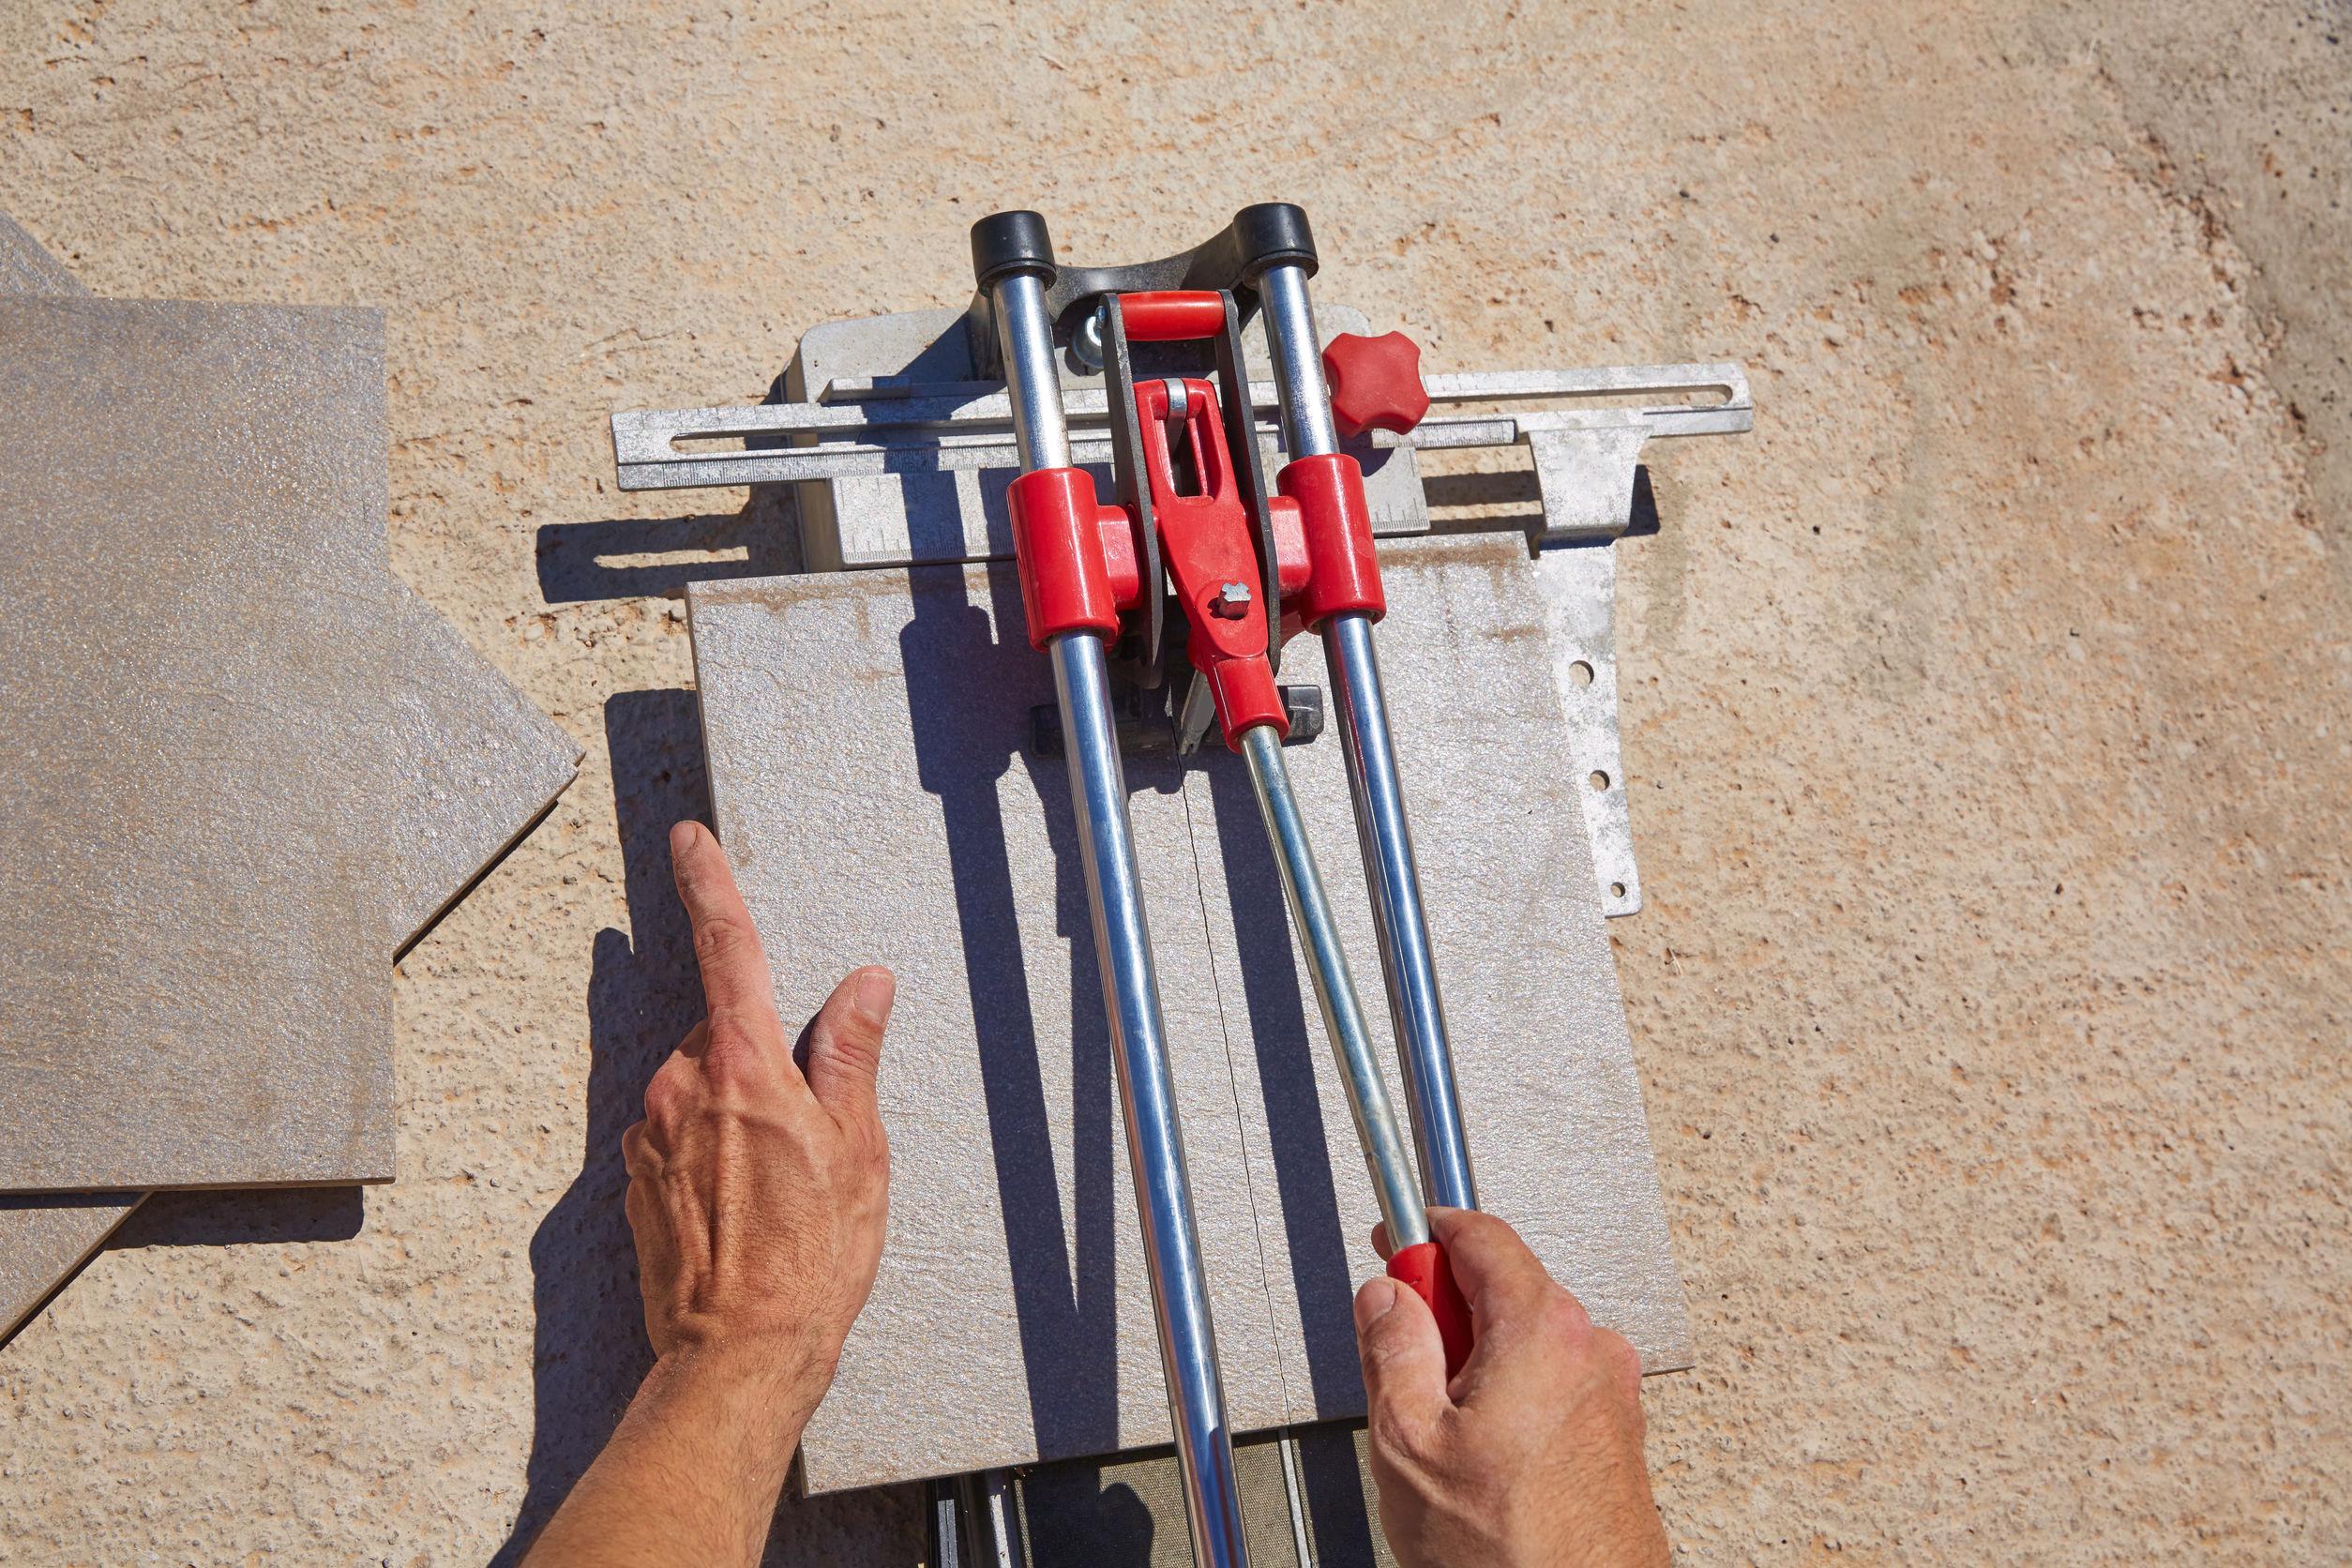 ferramenta de corte de azulejos